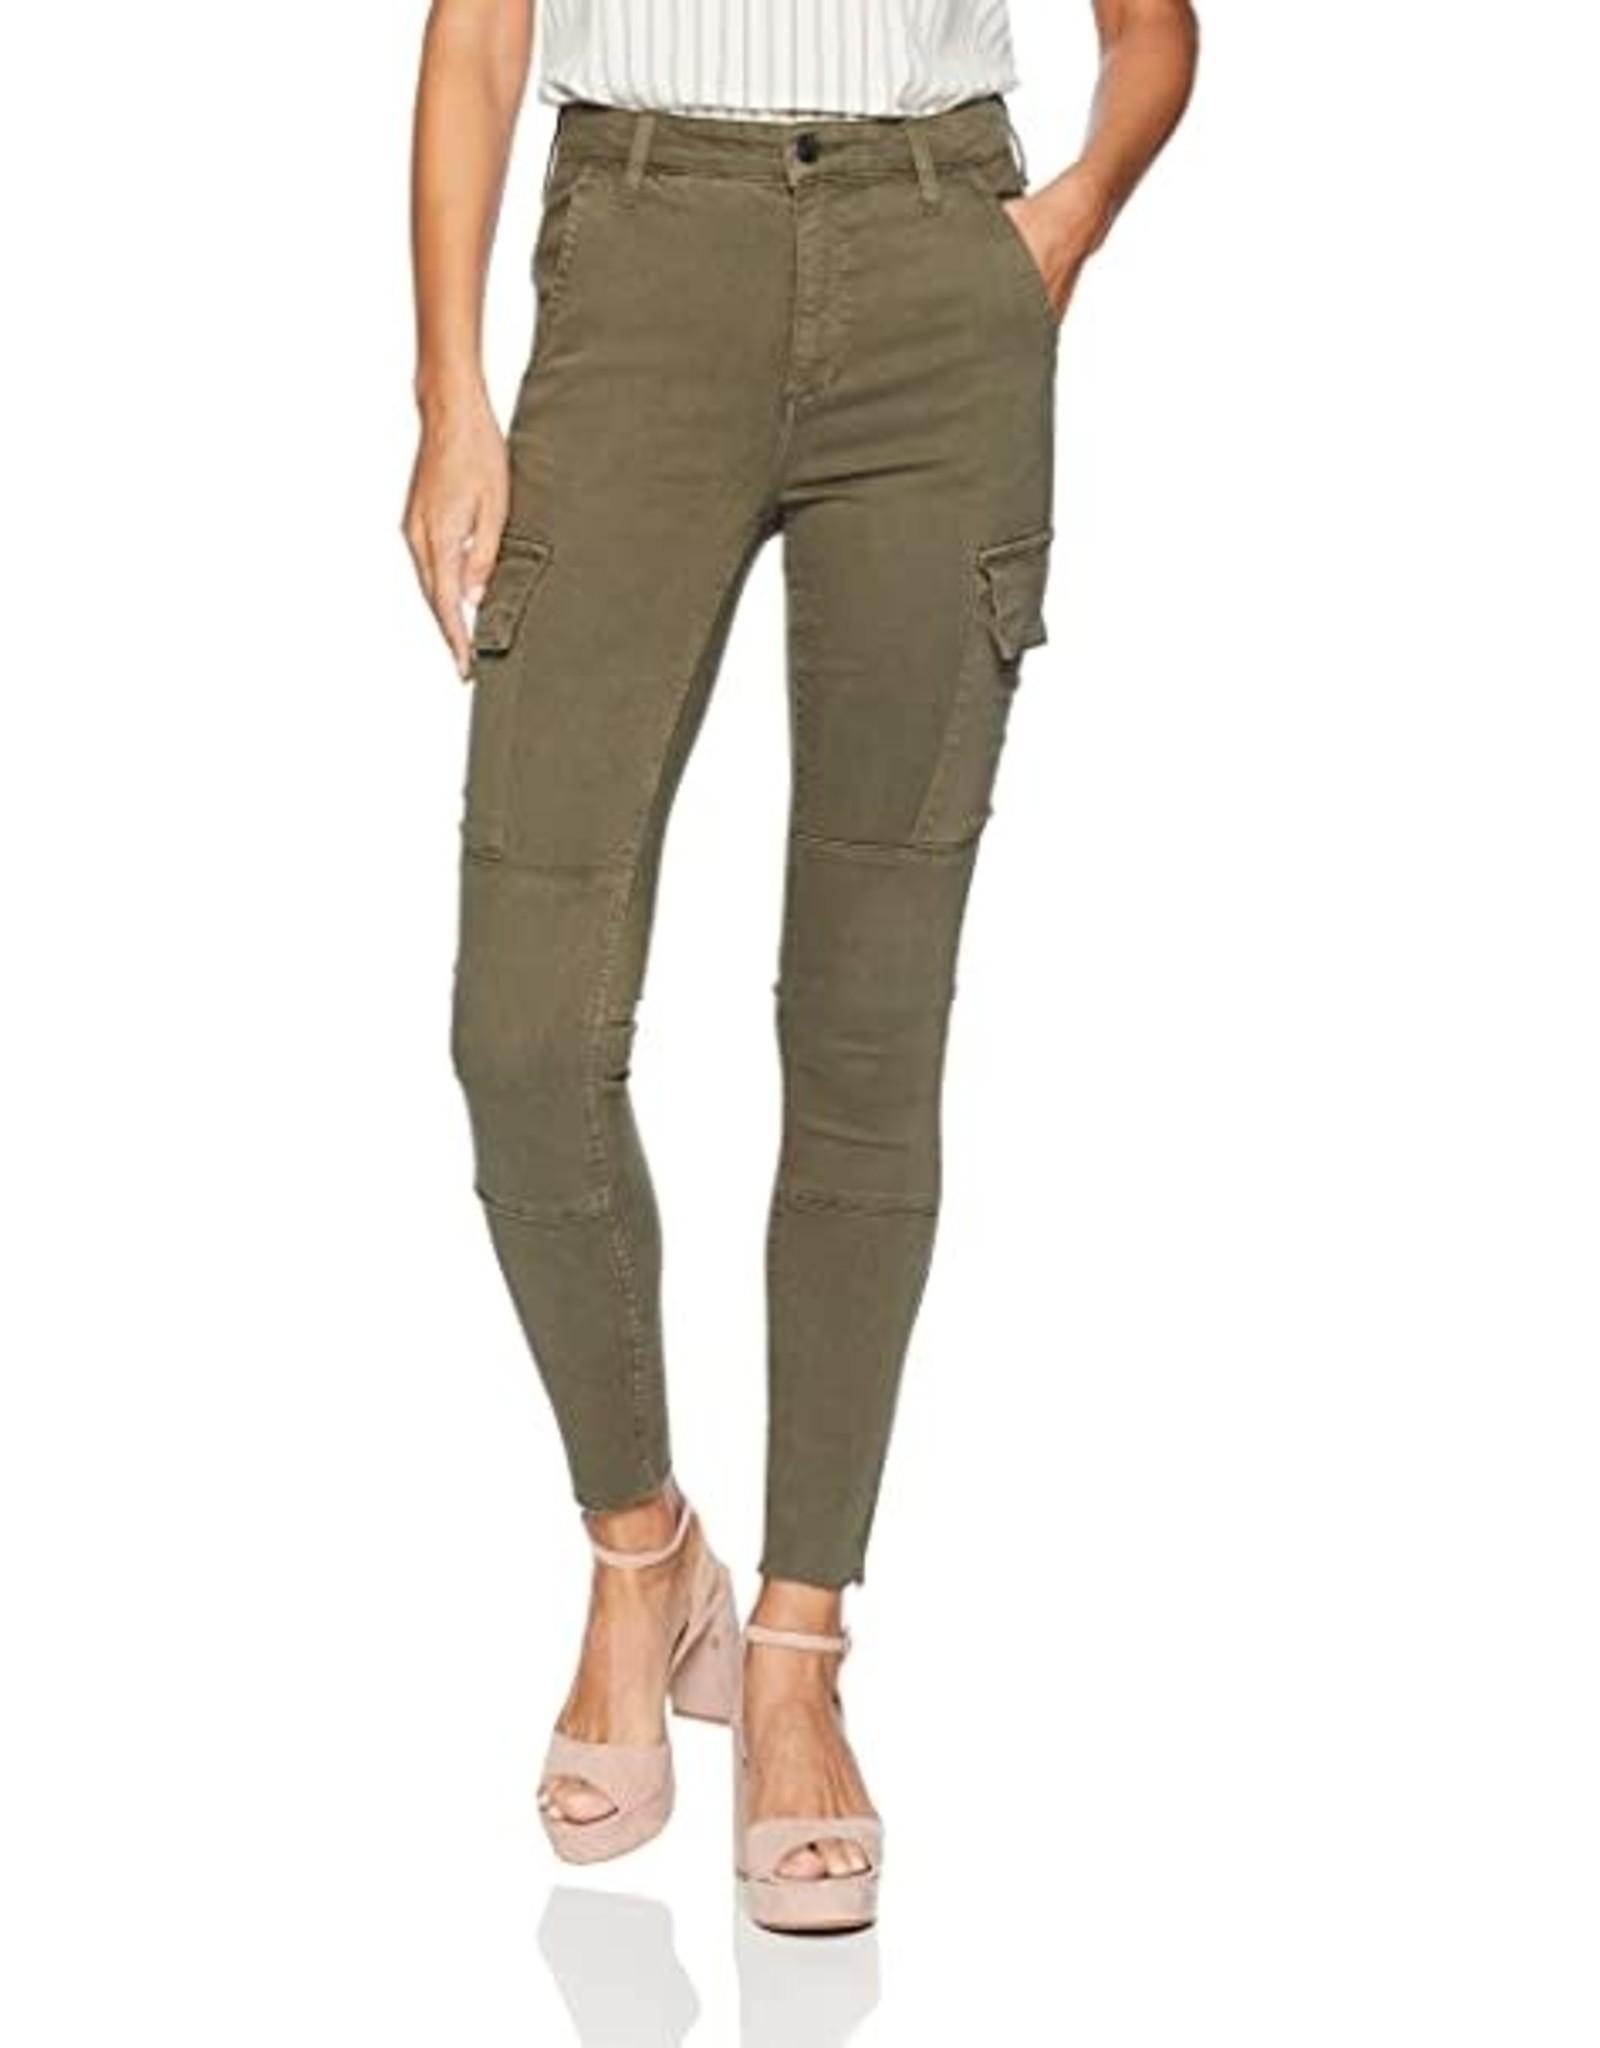 Joes Jeans Charlie Cargo Jean